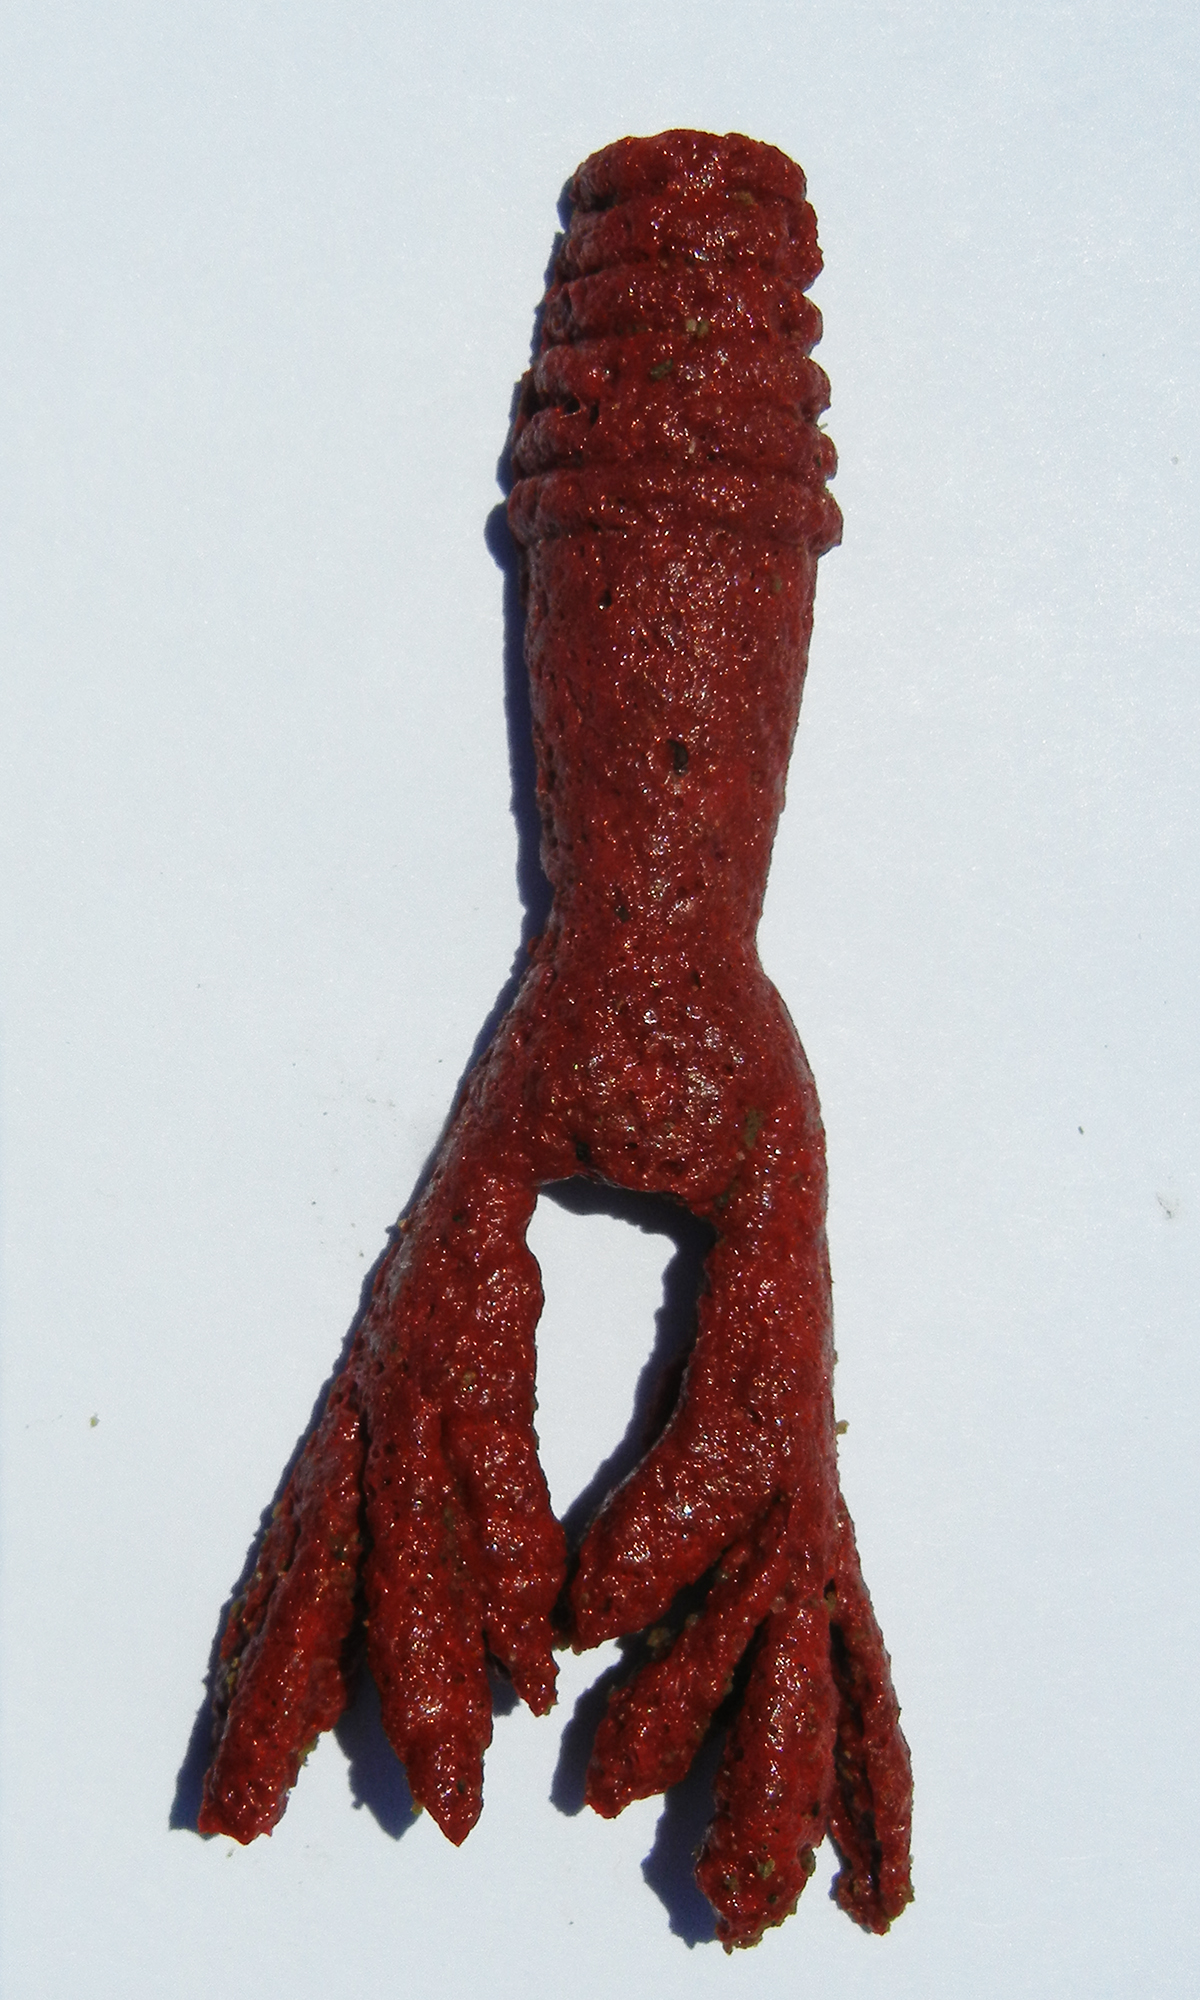 new-cajun-red-creature-bait-4-x-5.jpg